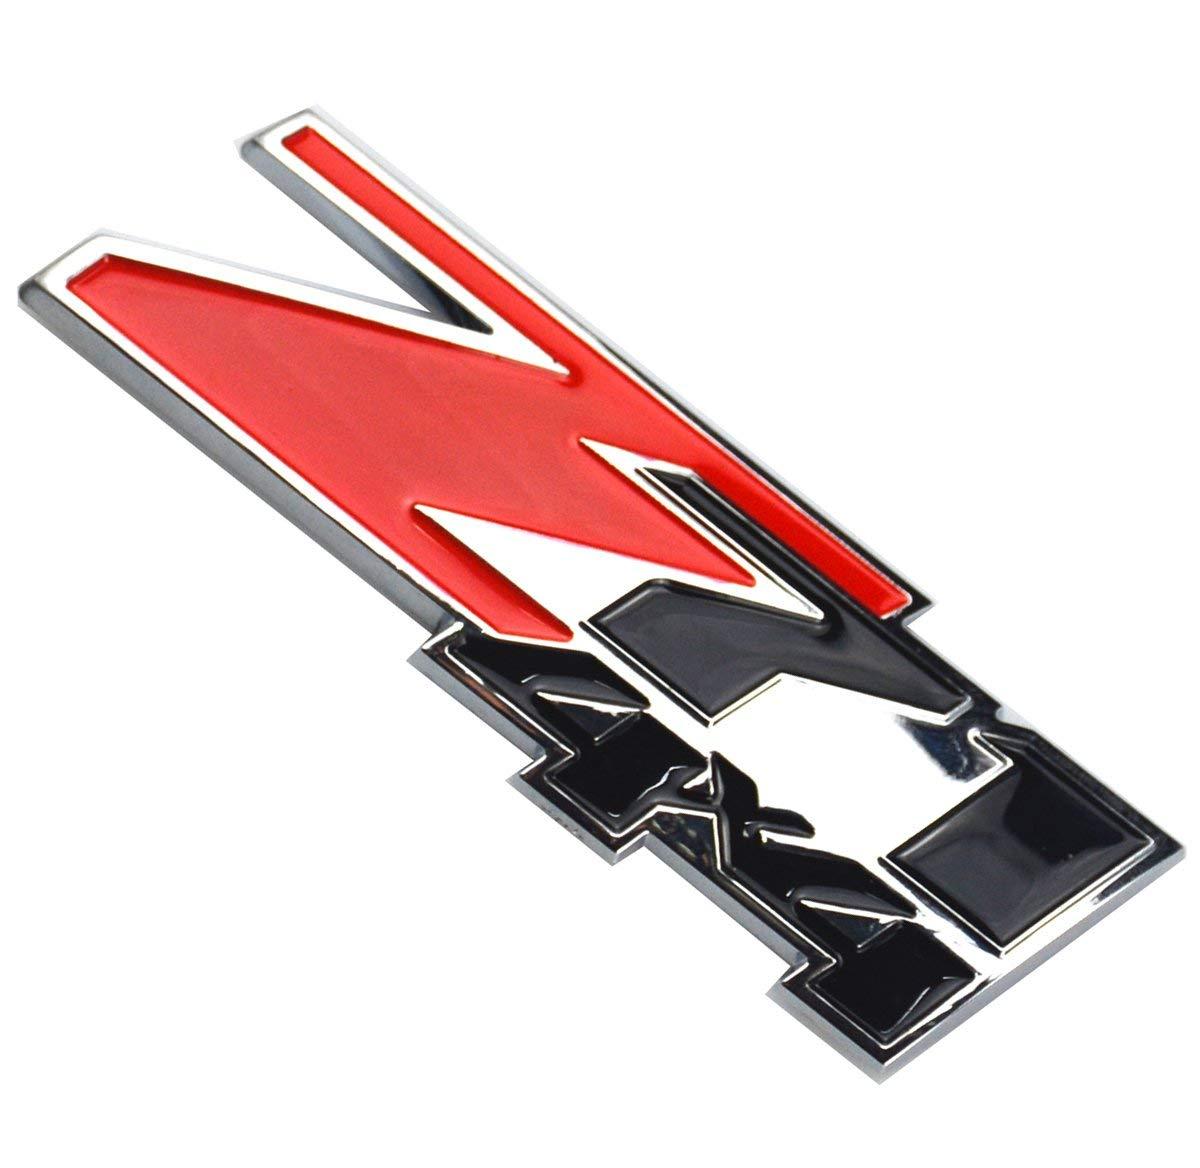 2 Pcs Z71 4x4 Emblems Compatible for GMC Chevy Silverado Sierra Tahoe Suburban 1500hd 2500hd 3500hd Decal Red